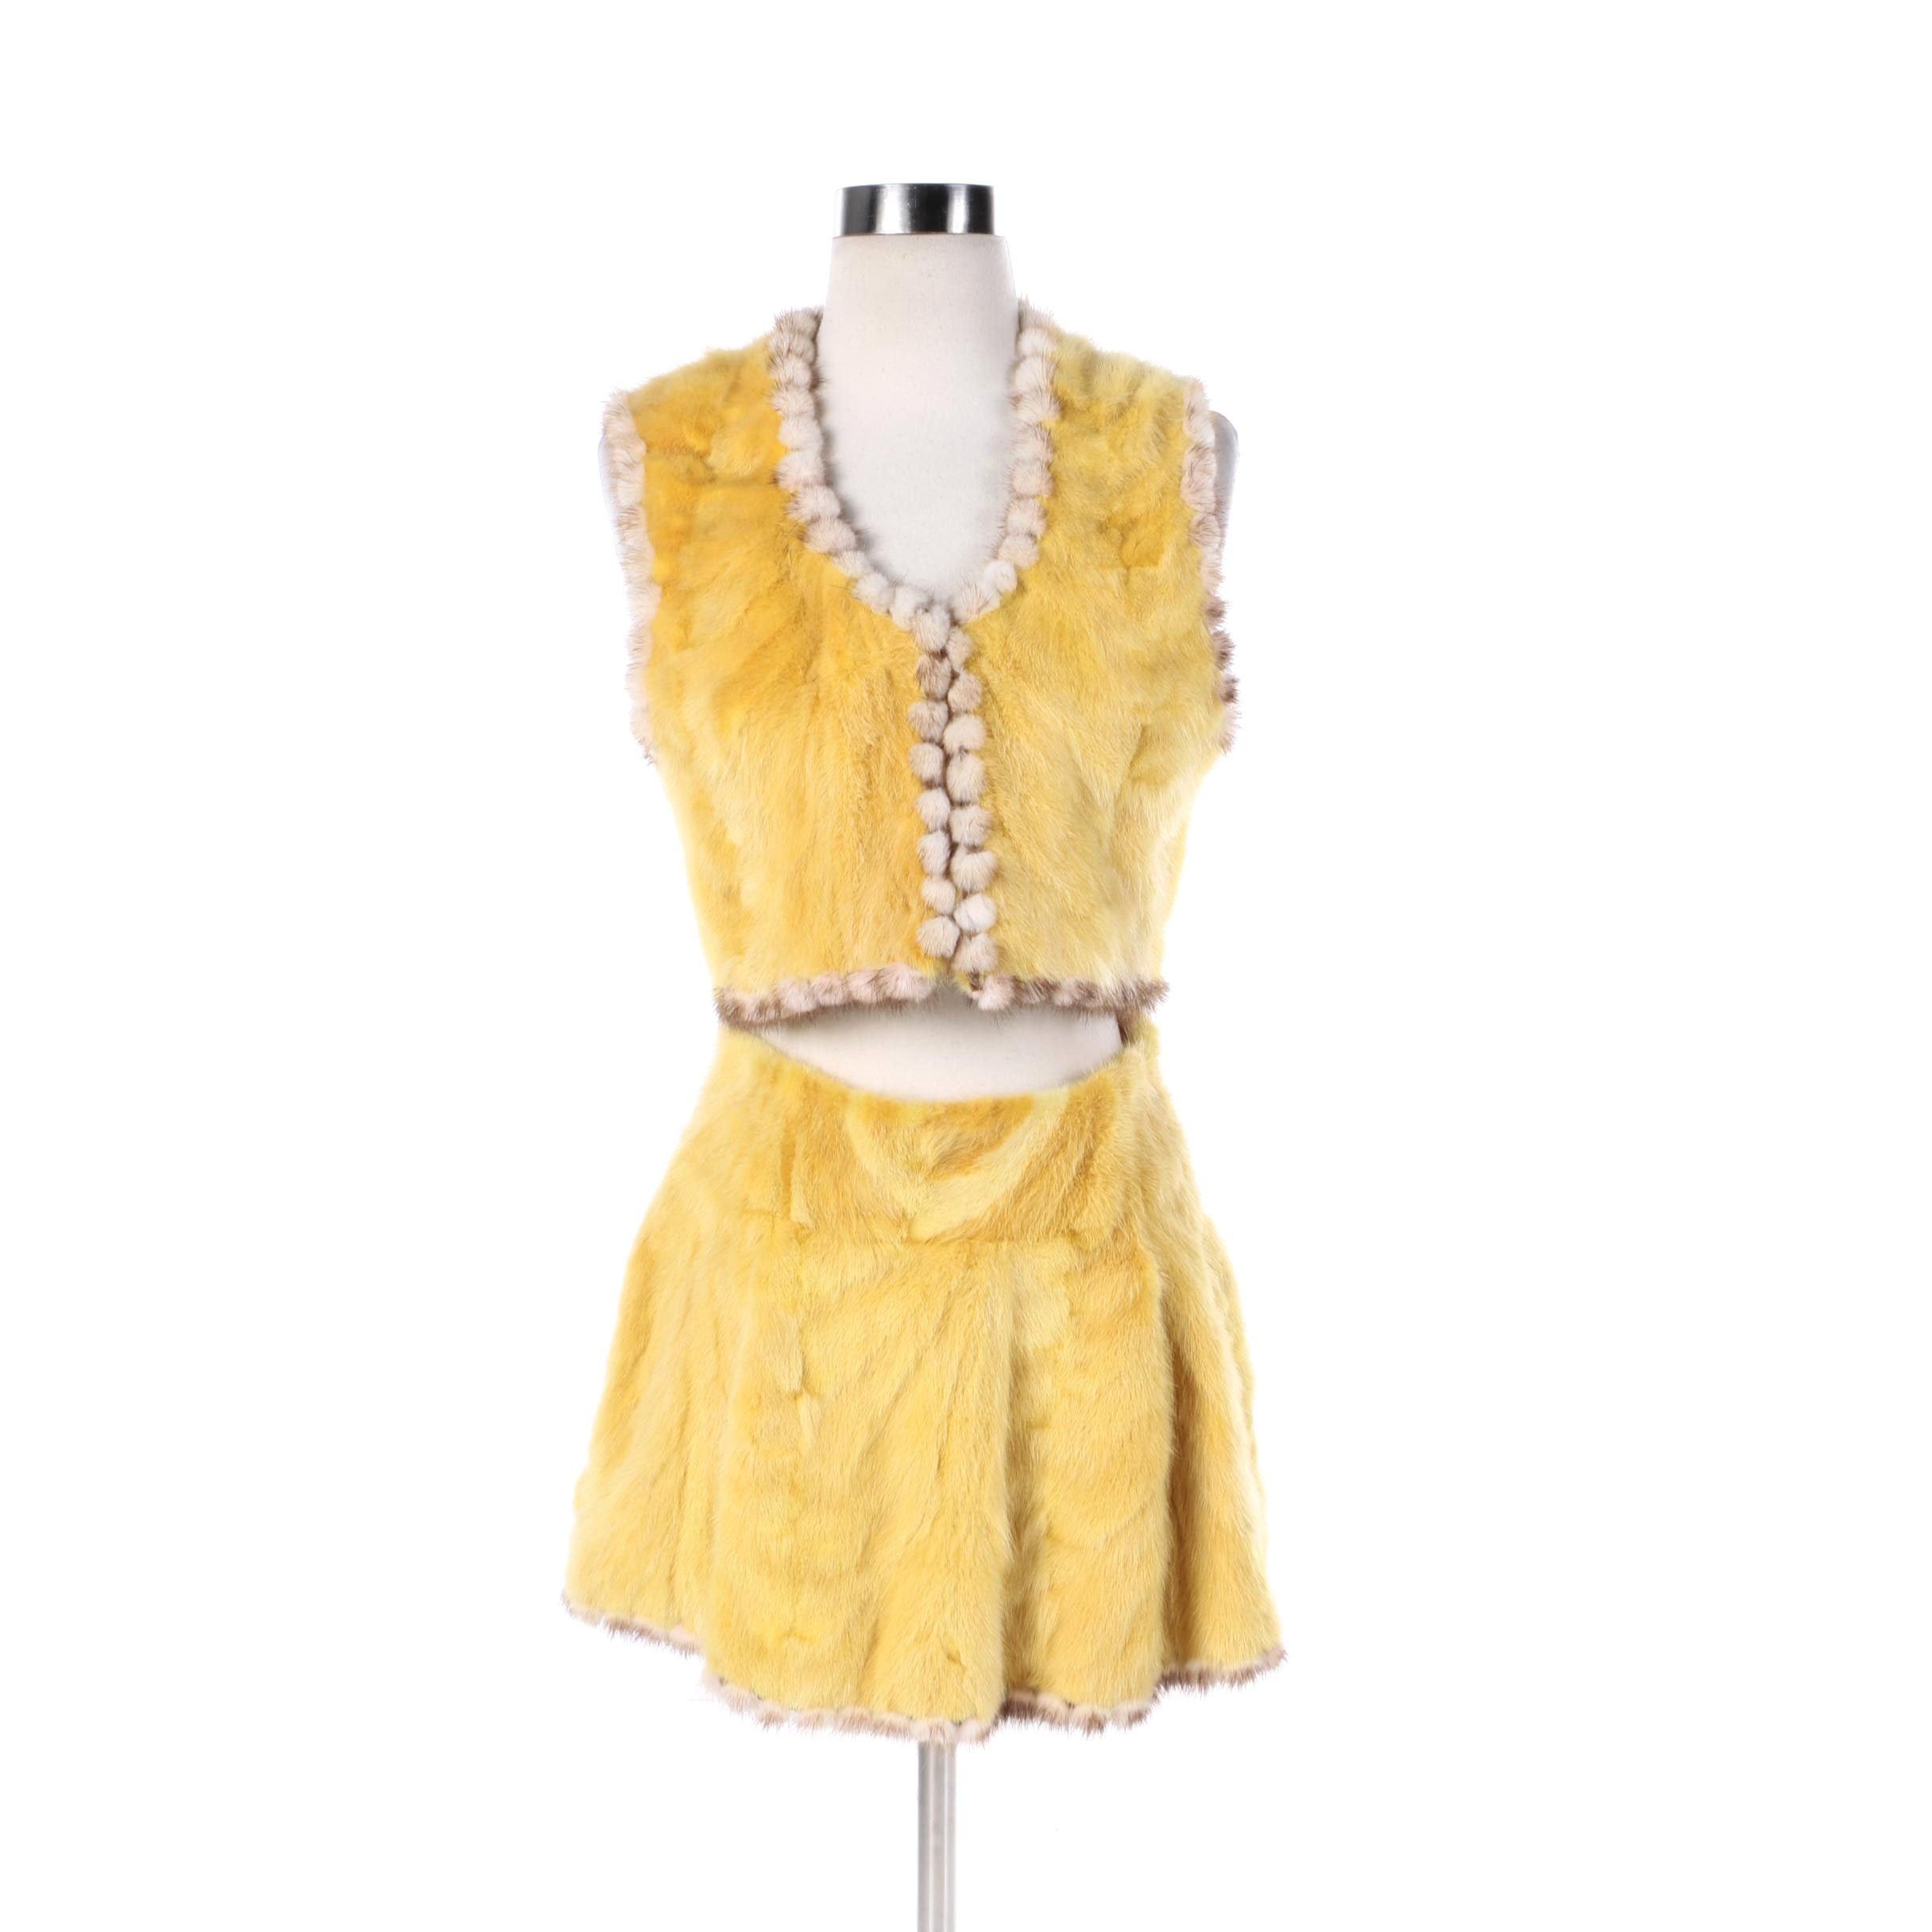 Women's A. Tsagas Yellow Dyed Mink Fur Vest and Mini Skirt